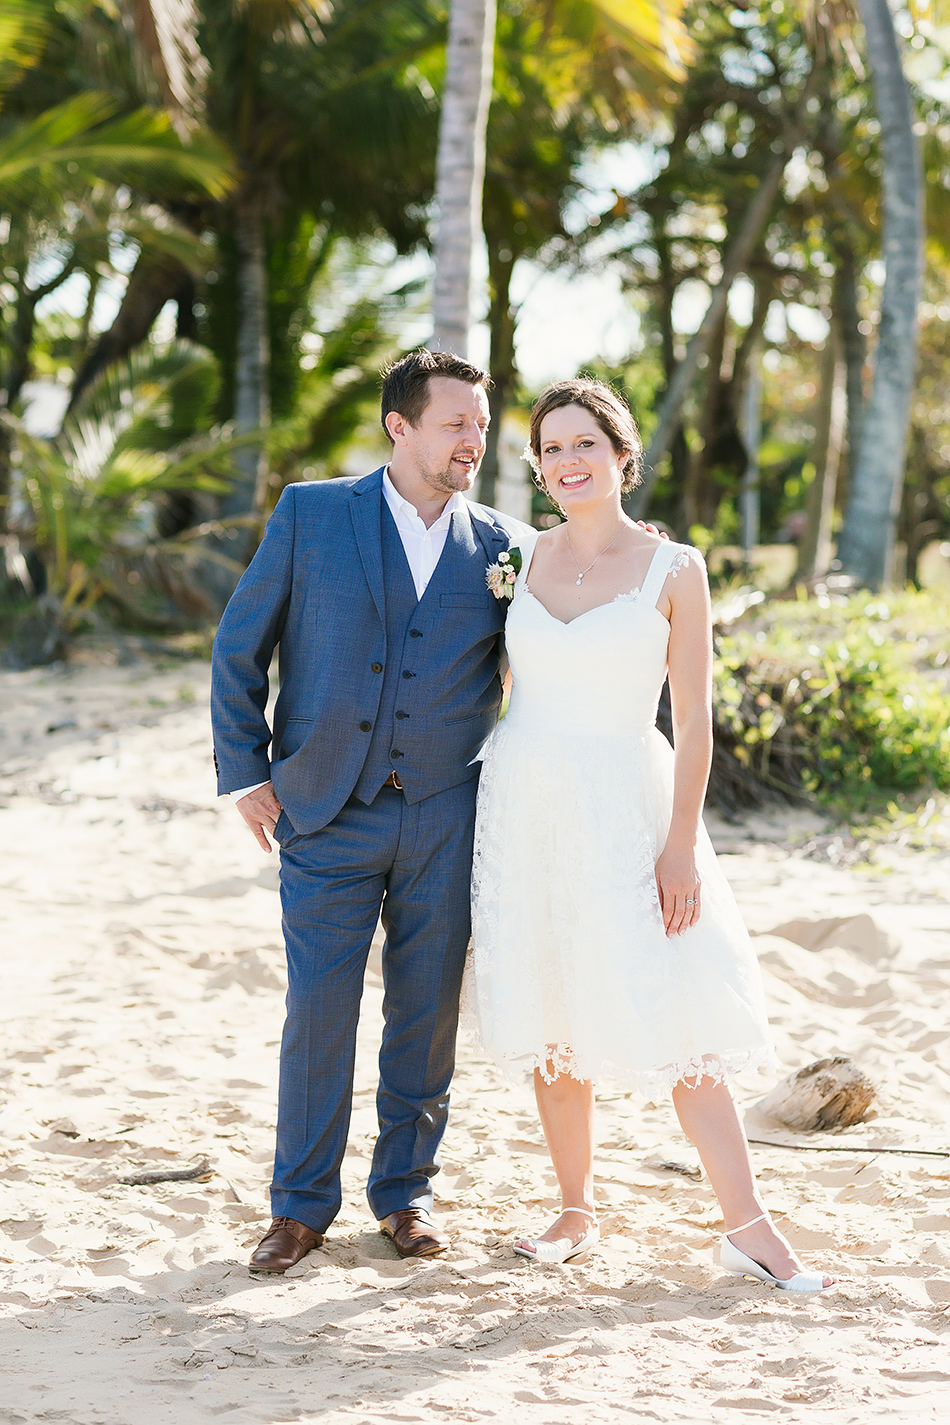 cool wedding photographer creative wedding photography the elandra mission beach